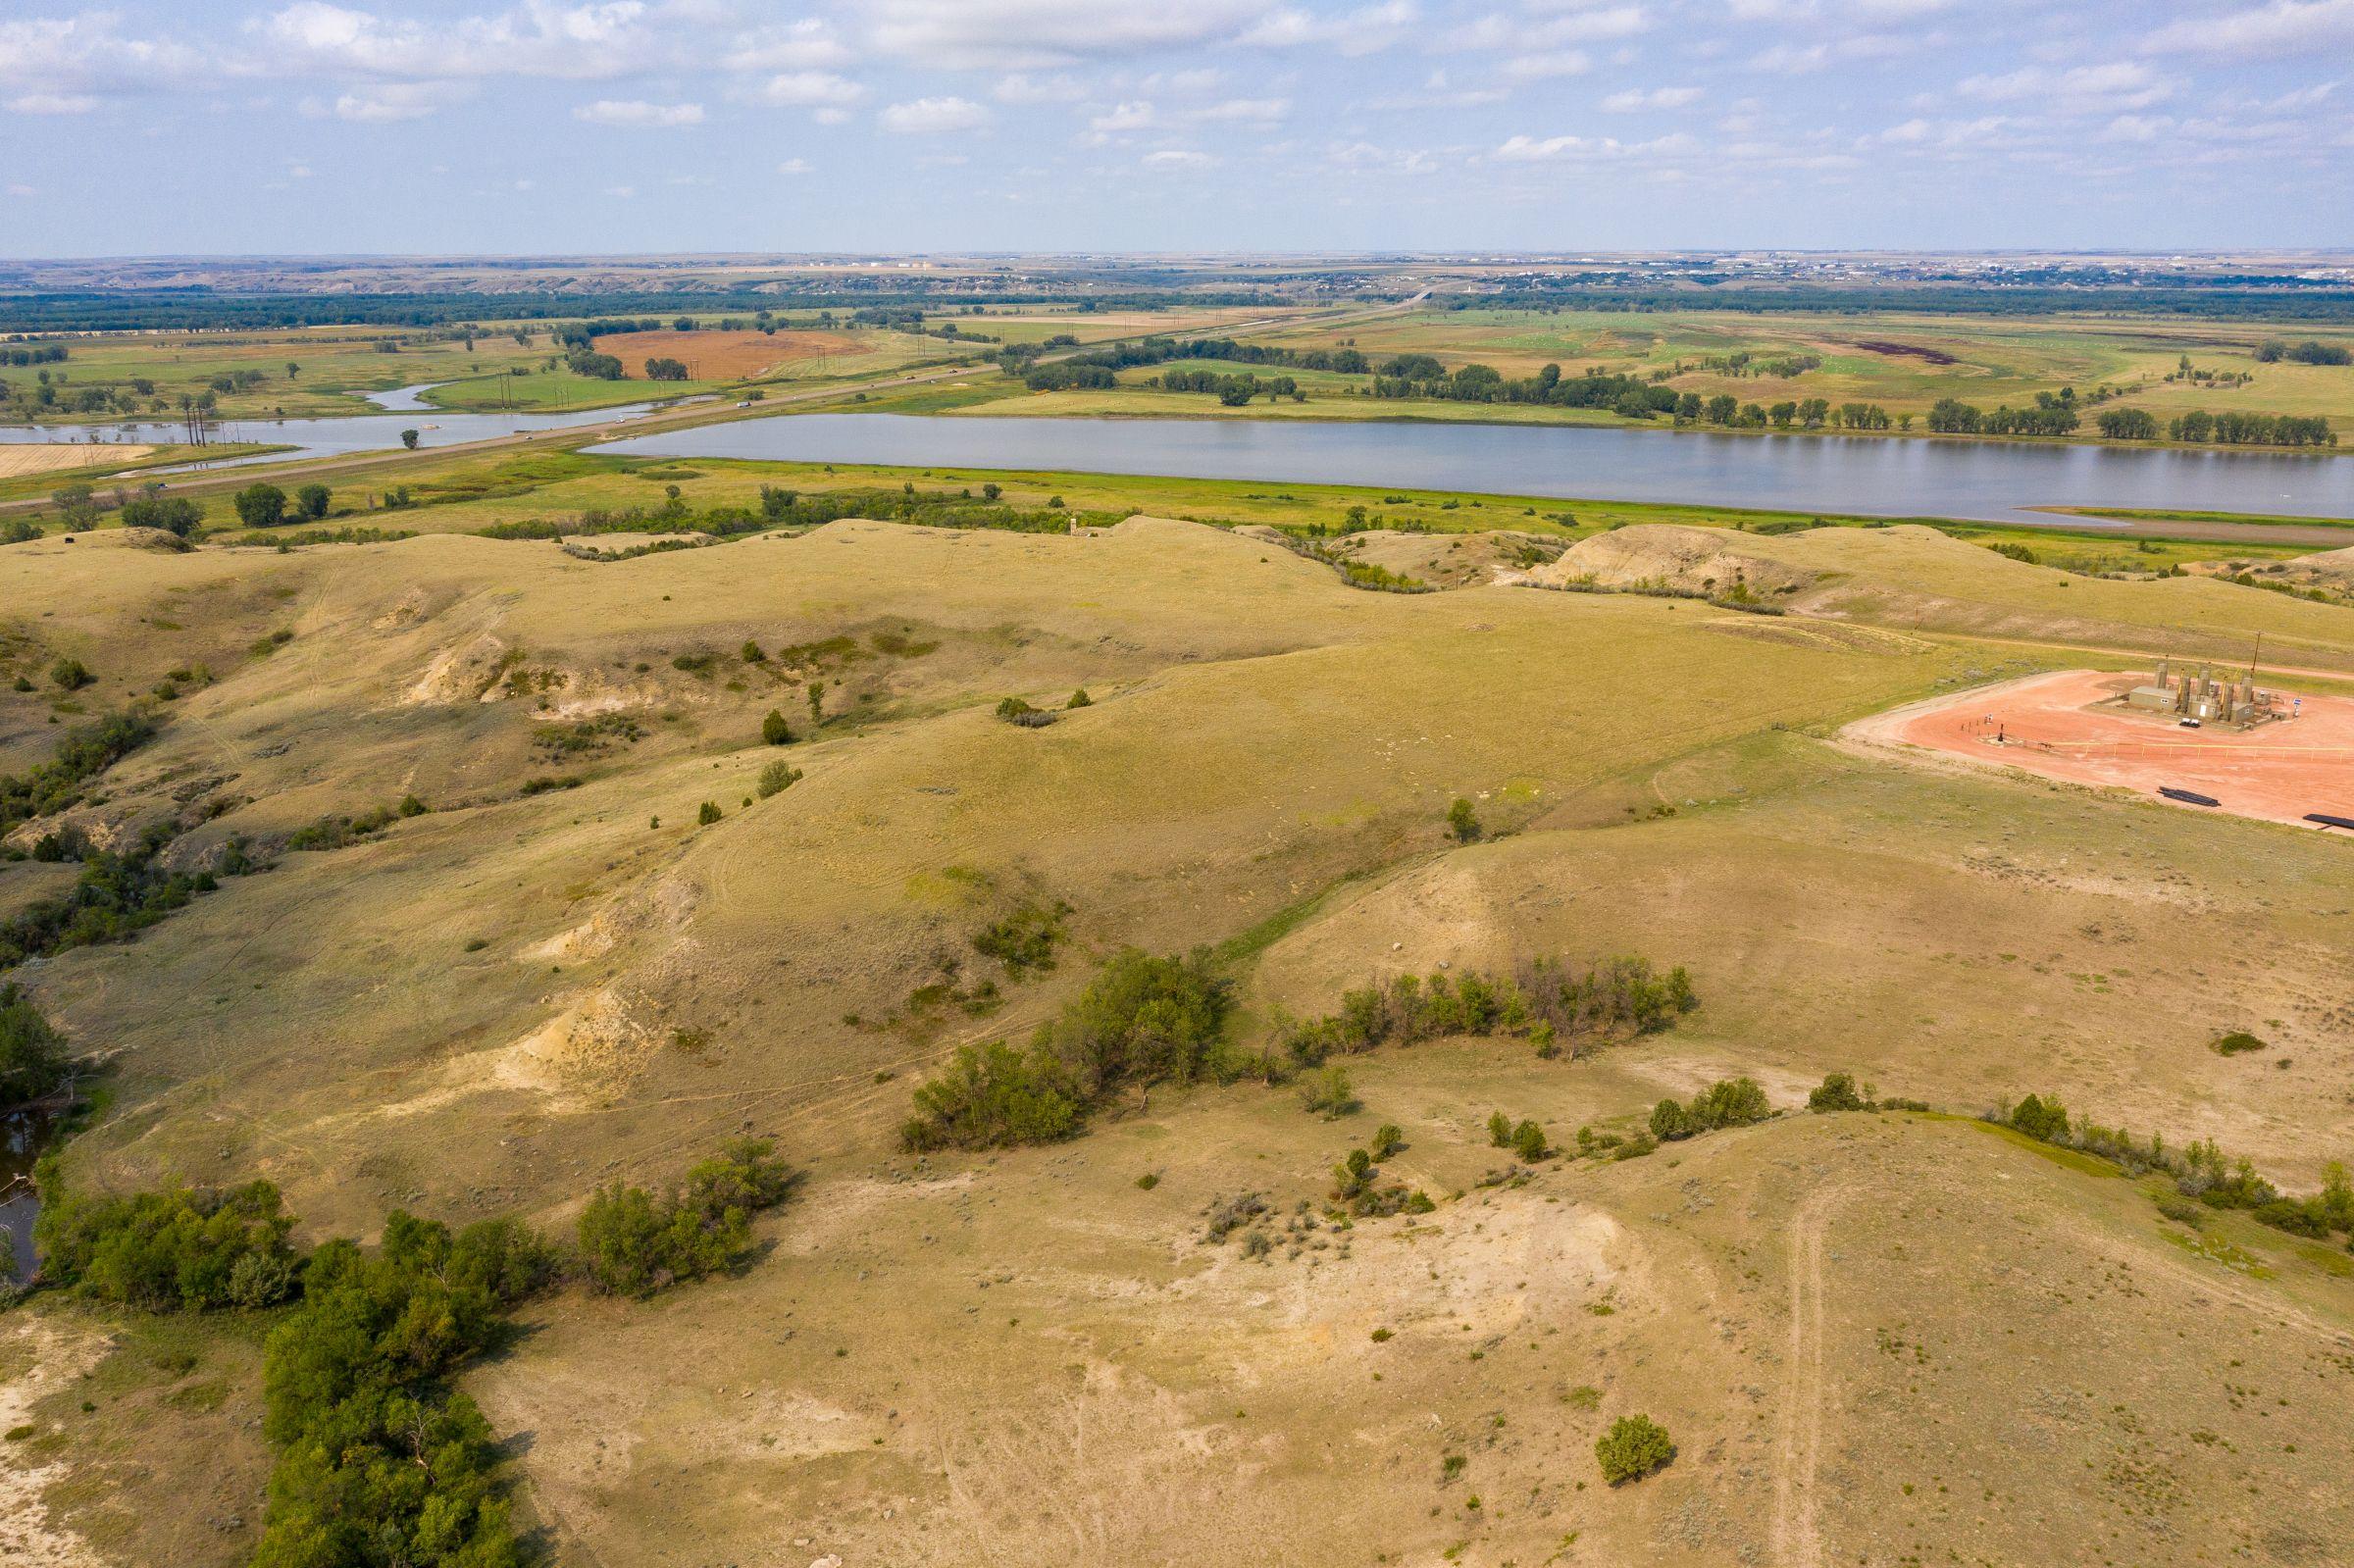 auctions-land-mckenzie-county-north-dakota-270-acres-listing-number-15735-2-2021-09-10-135954.jpeg